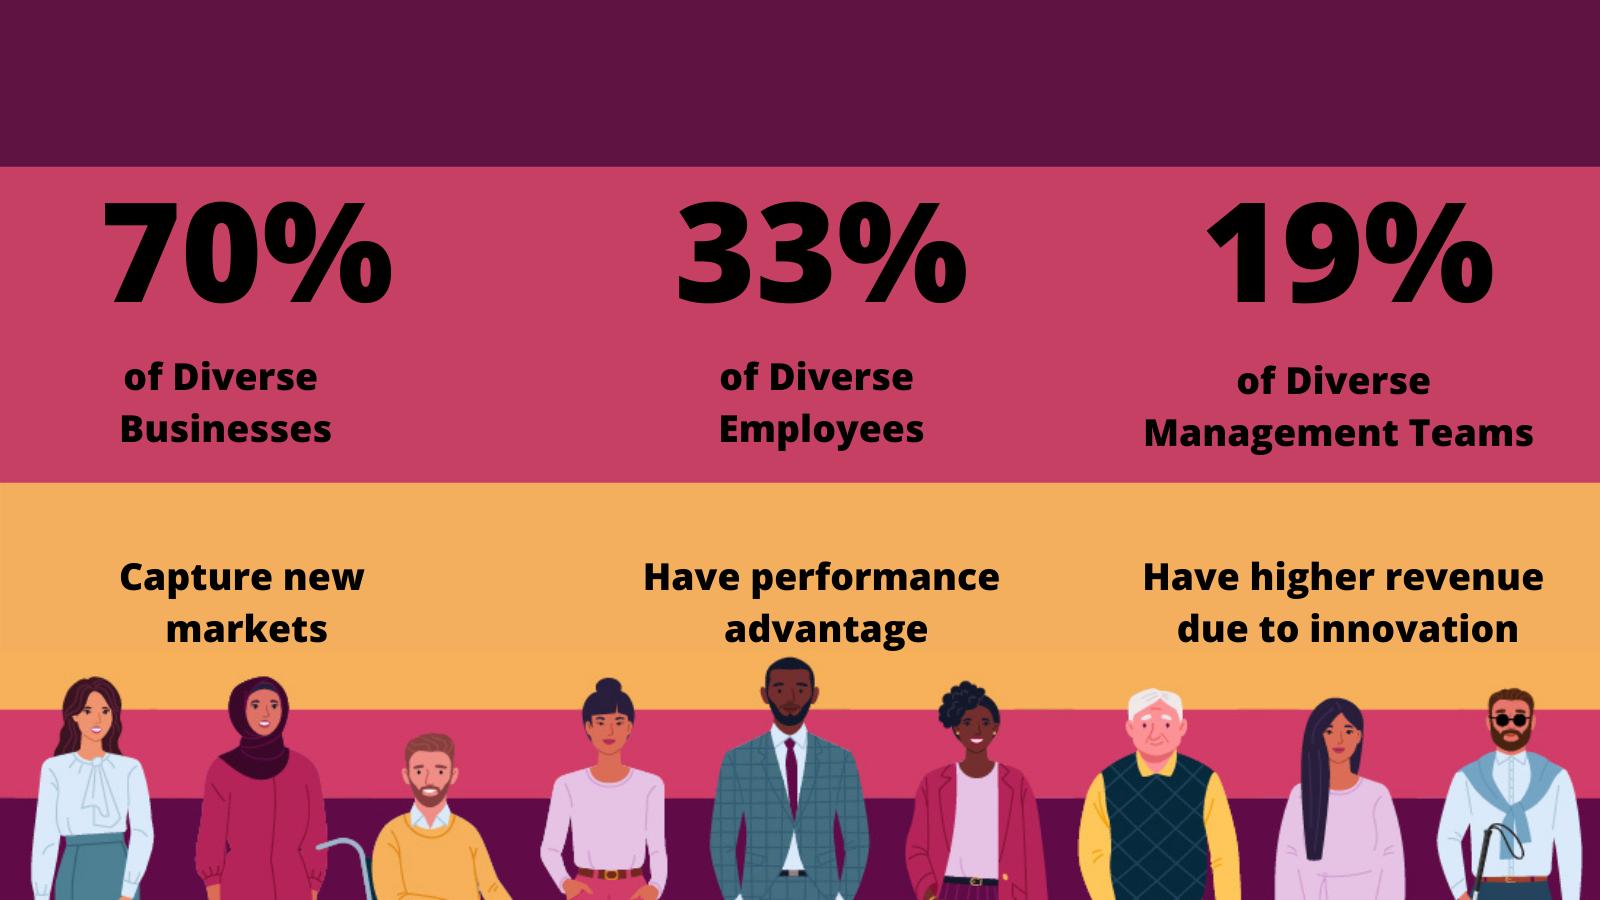 Benefits of Diversity in Organizations